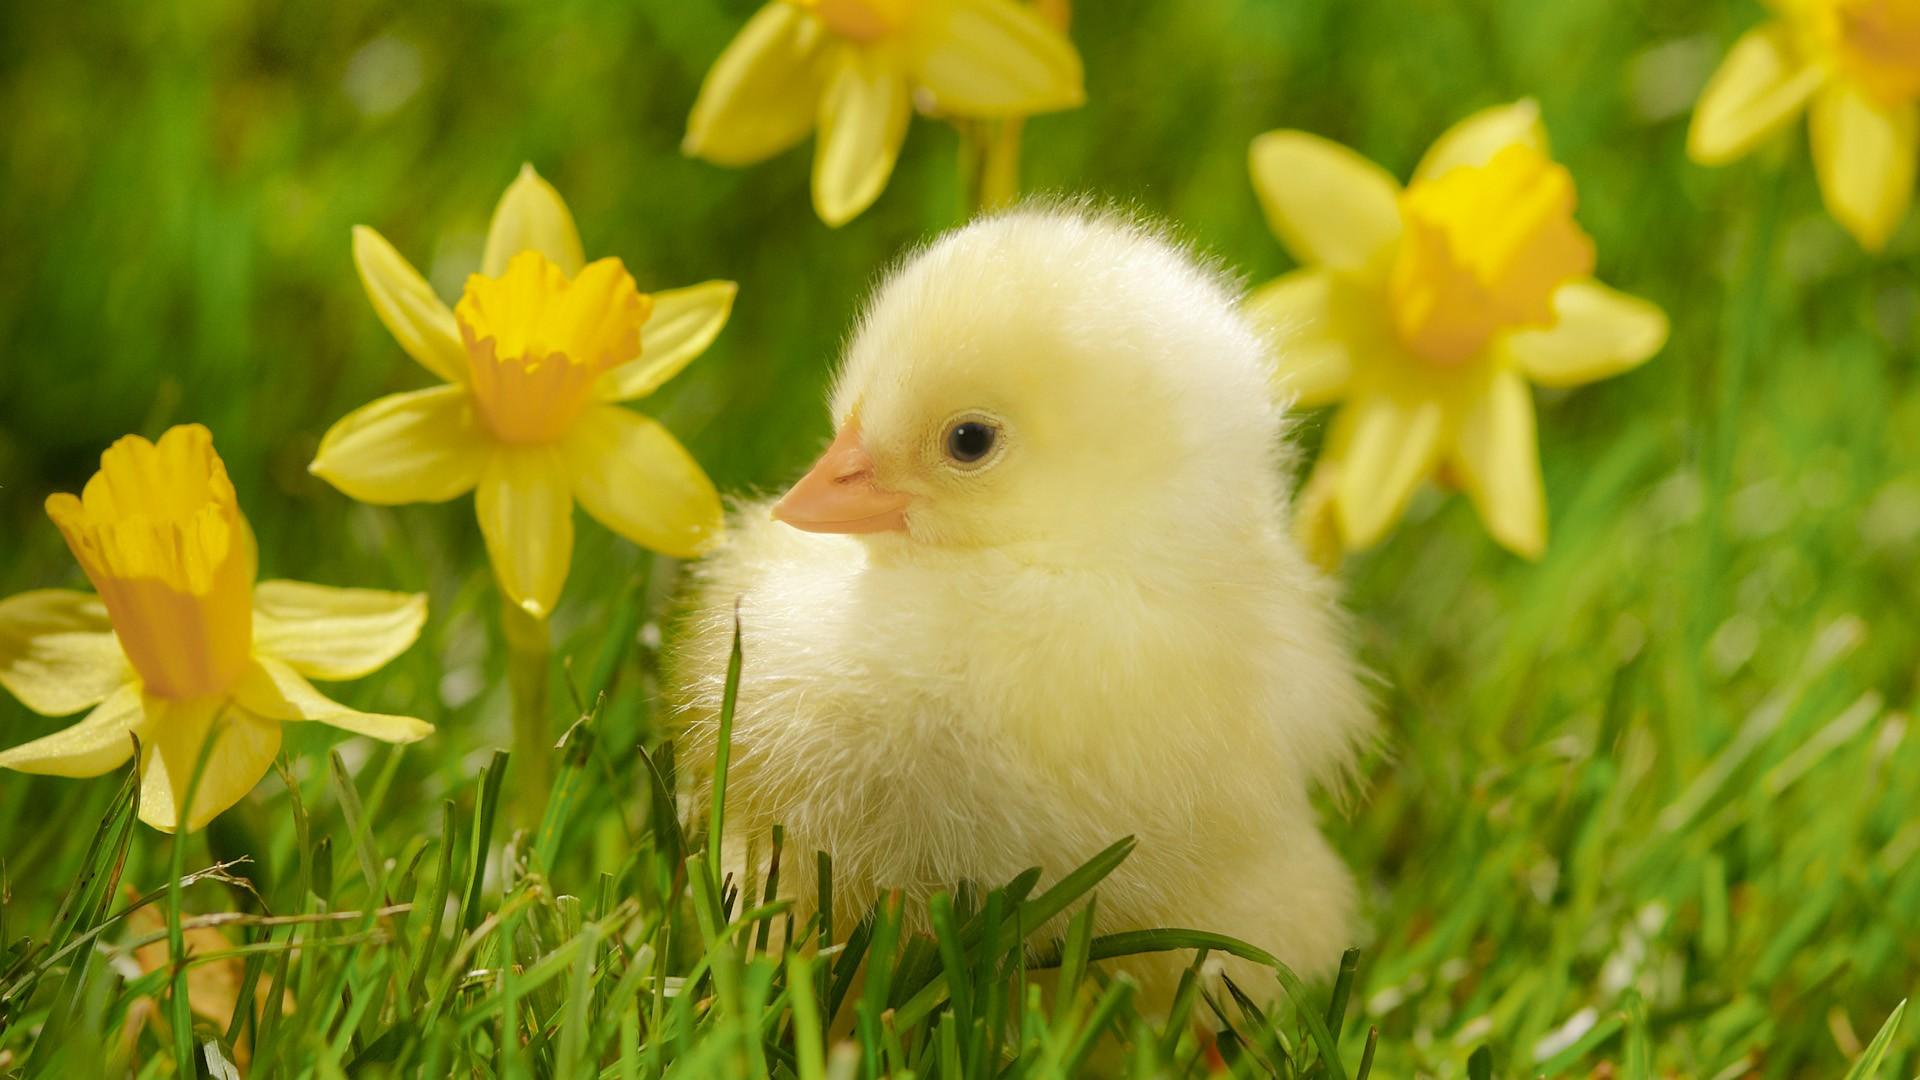 Spring Blooms Bird Desktop Image Wallpaper Size 1920x1080 1920x1080